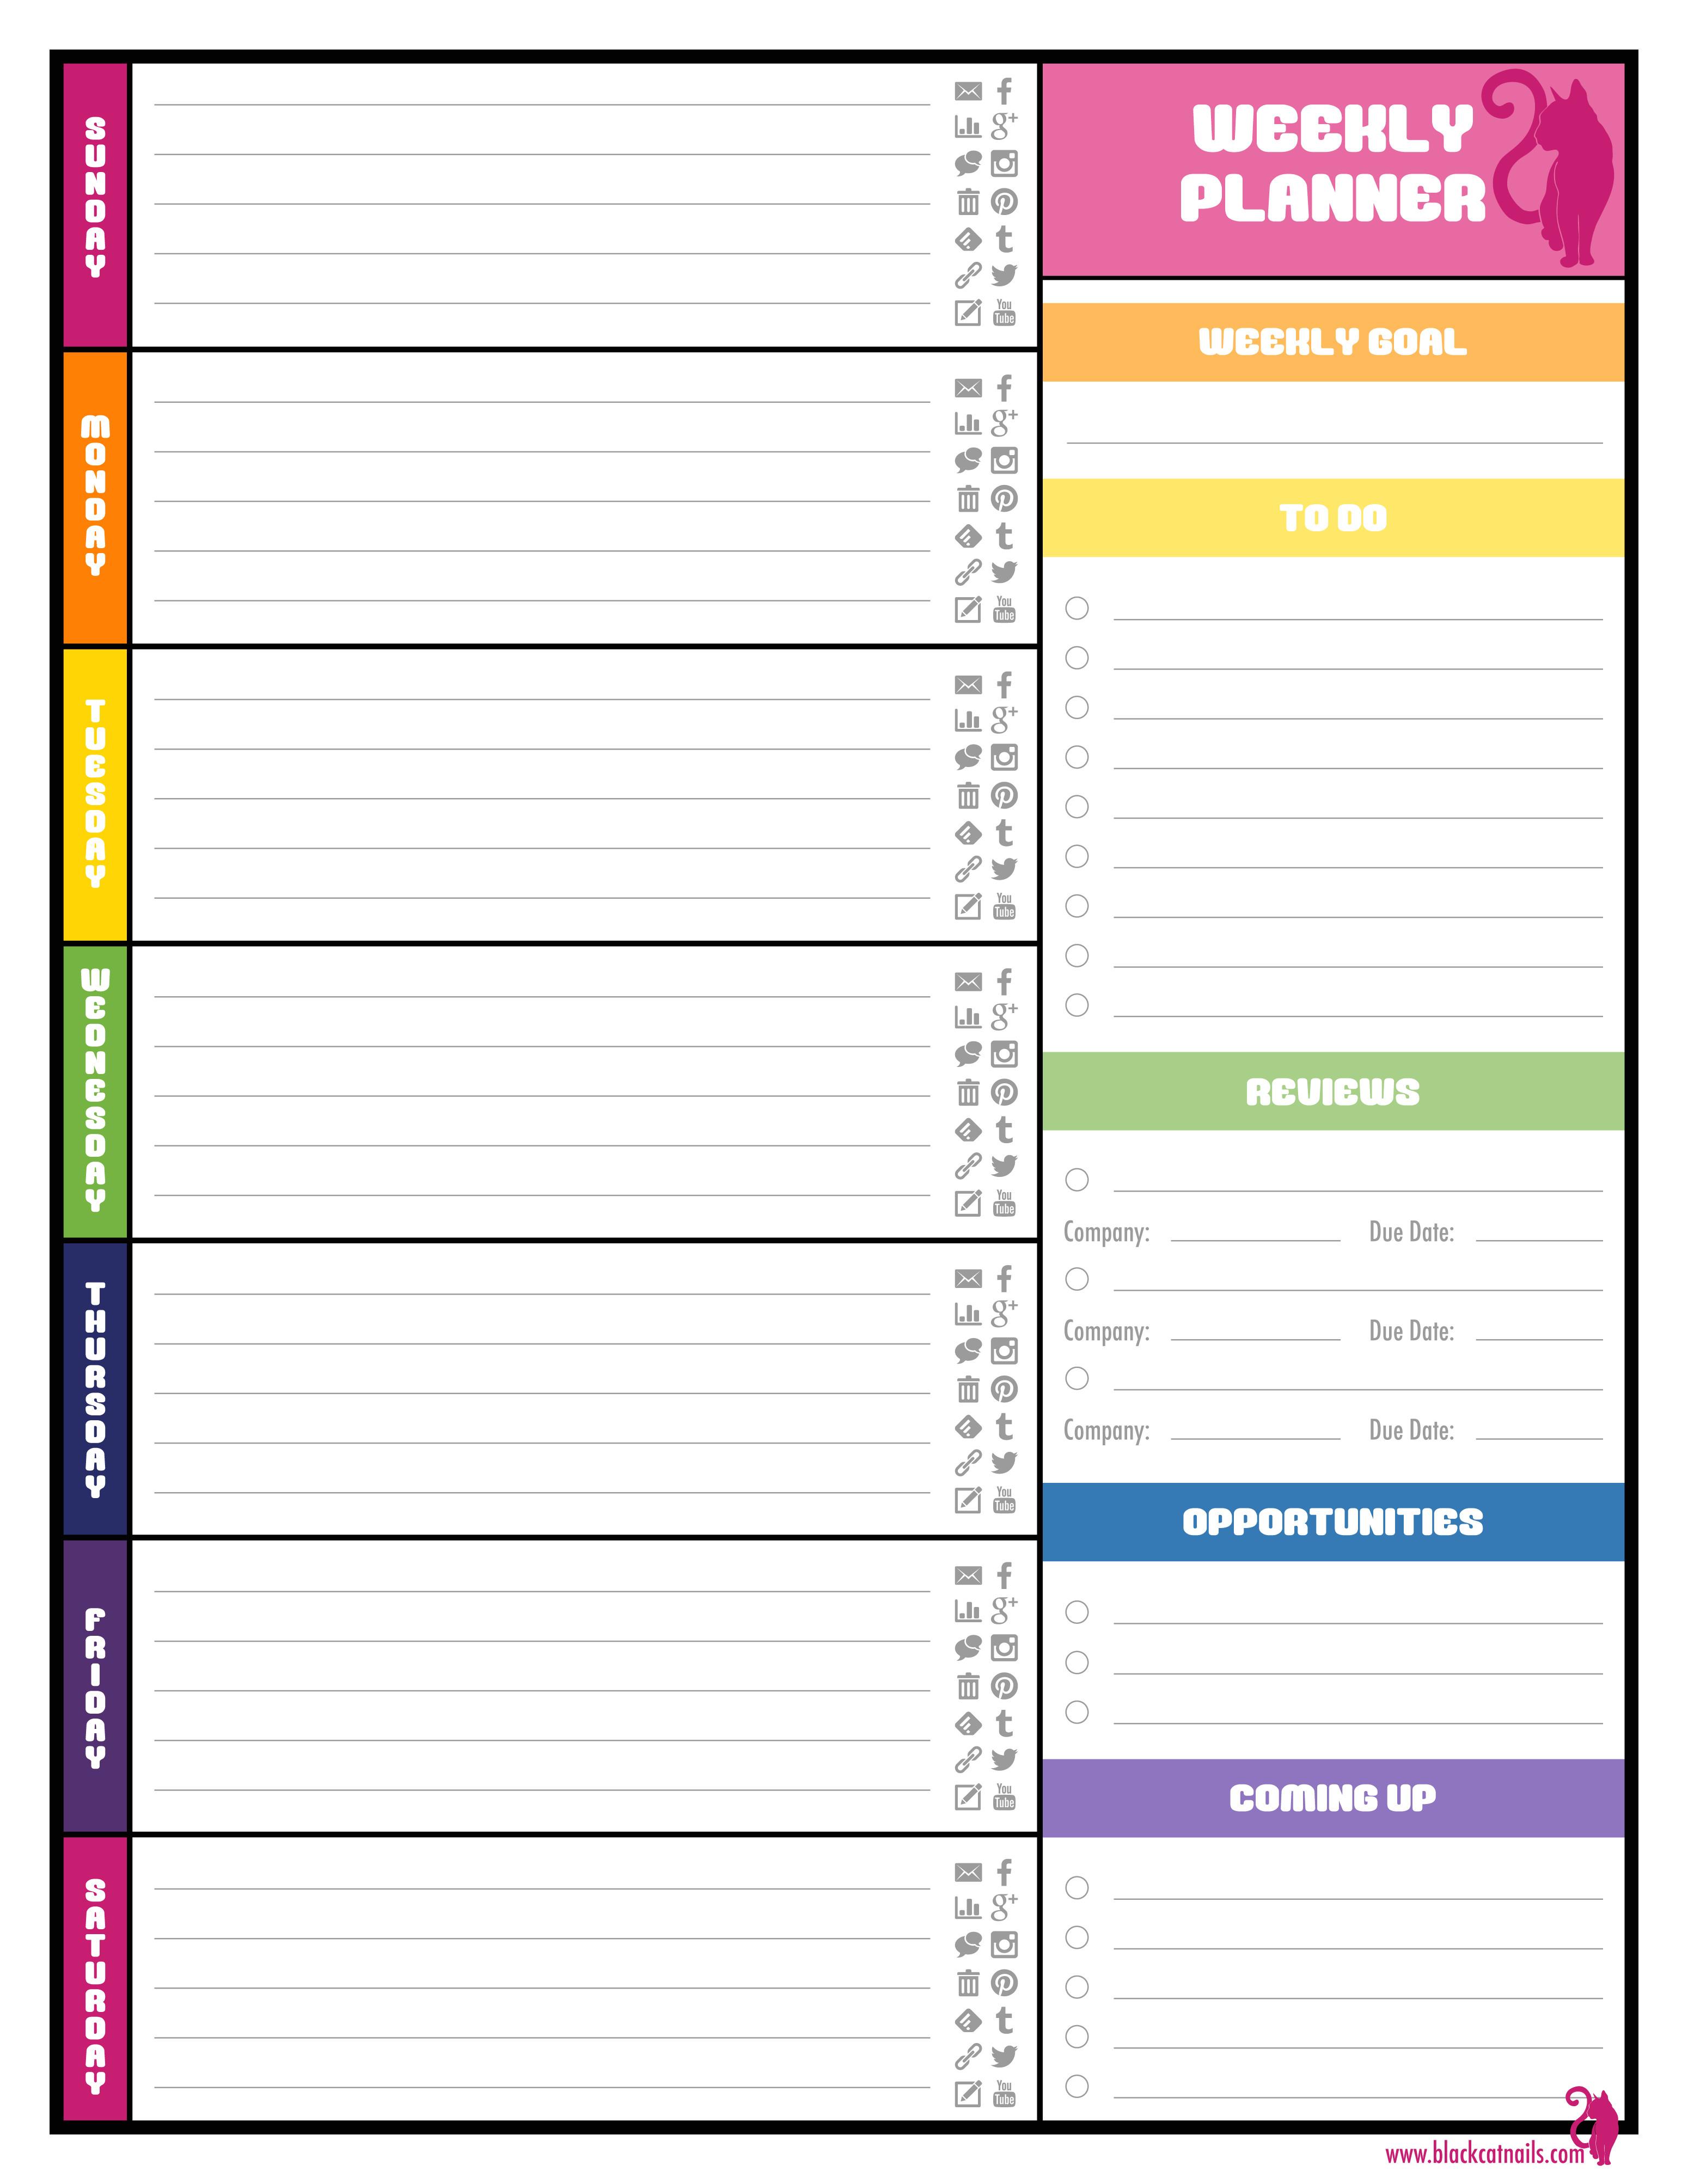 Week organizer Template Colorful Weekly Blogging Planner Blogger Calendar